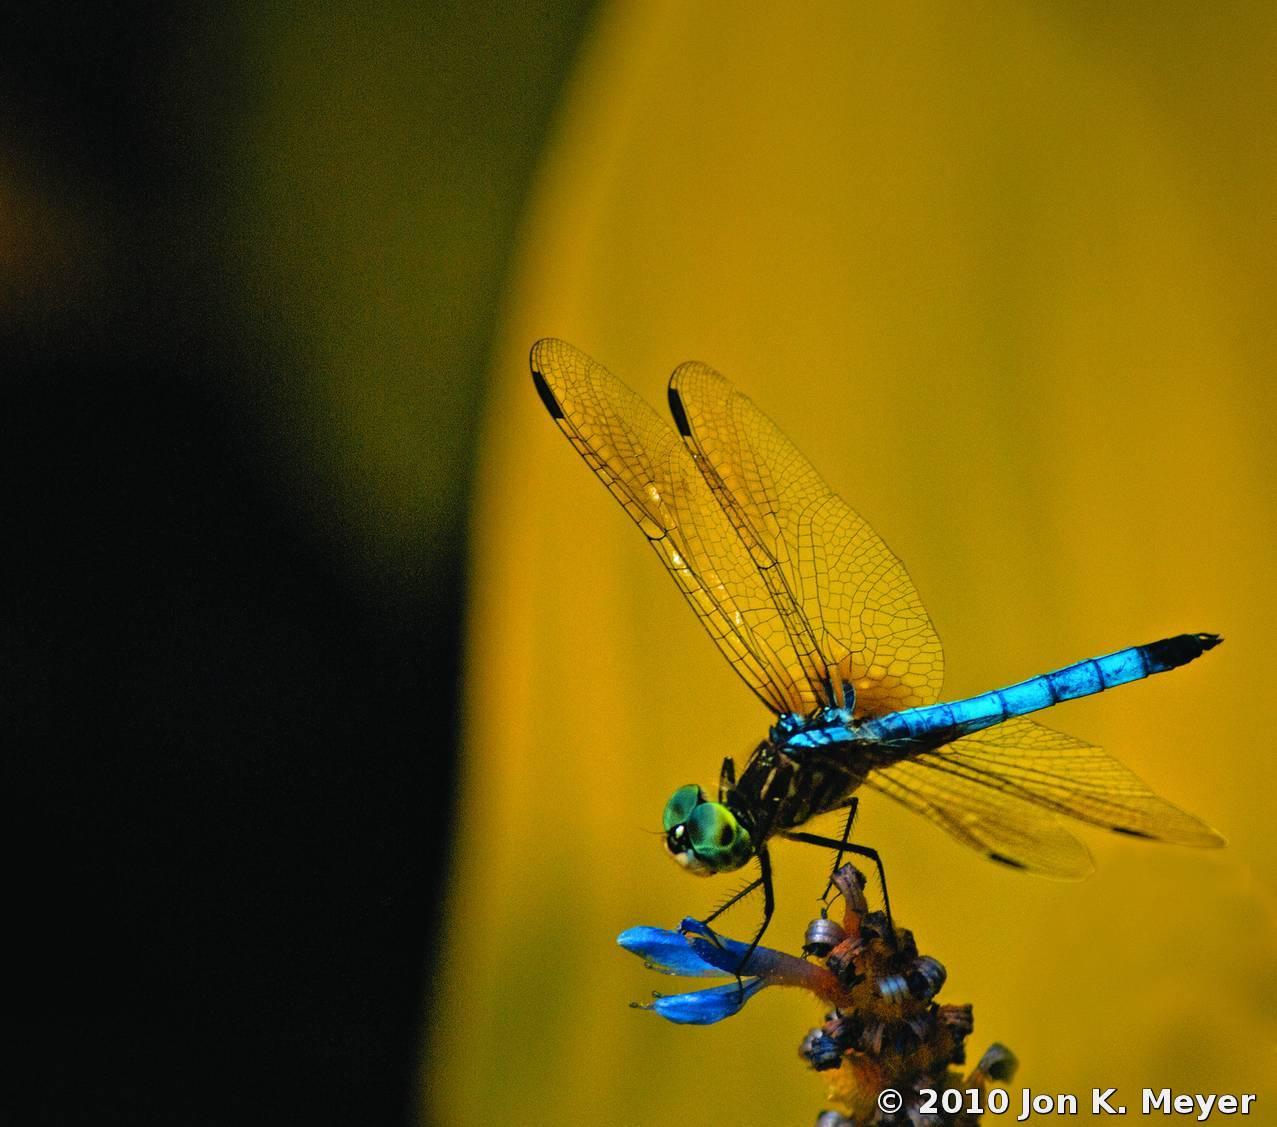 Electric Blue Dragonfly By Jon K Meyer Black Amp White